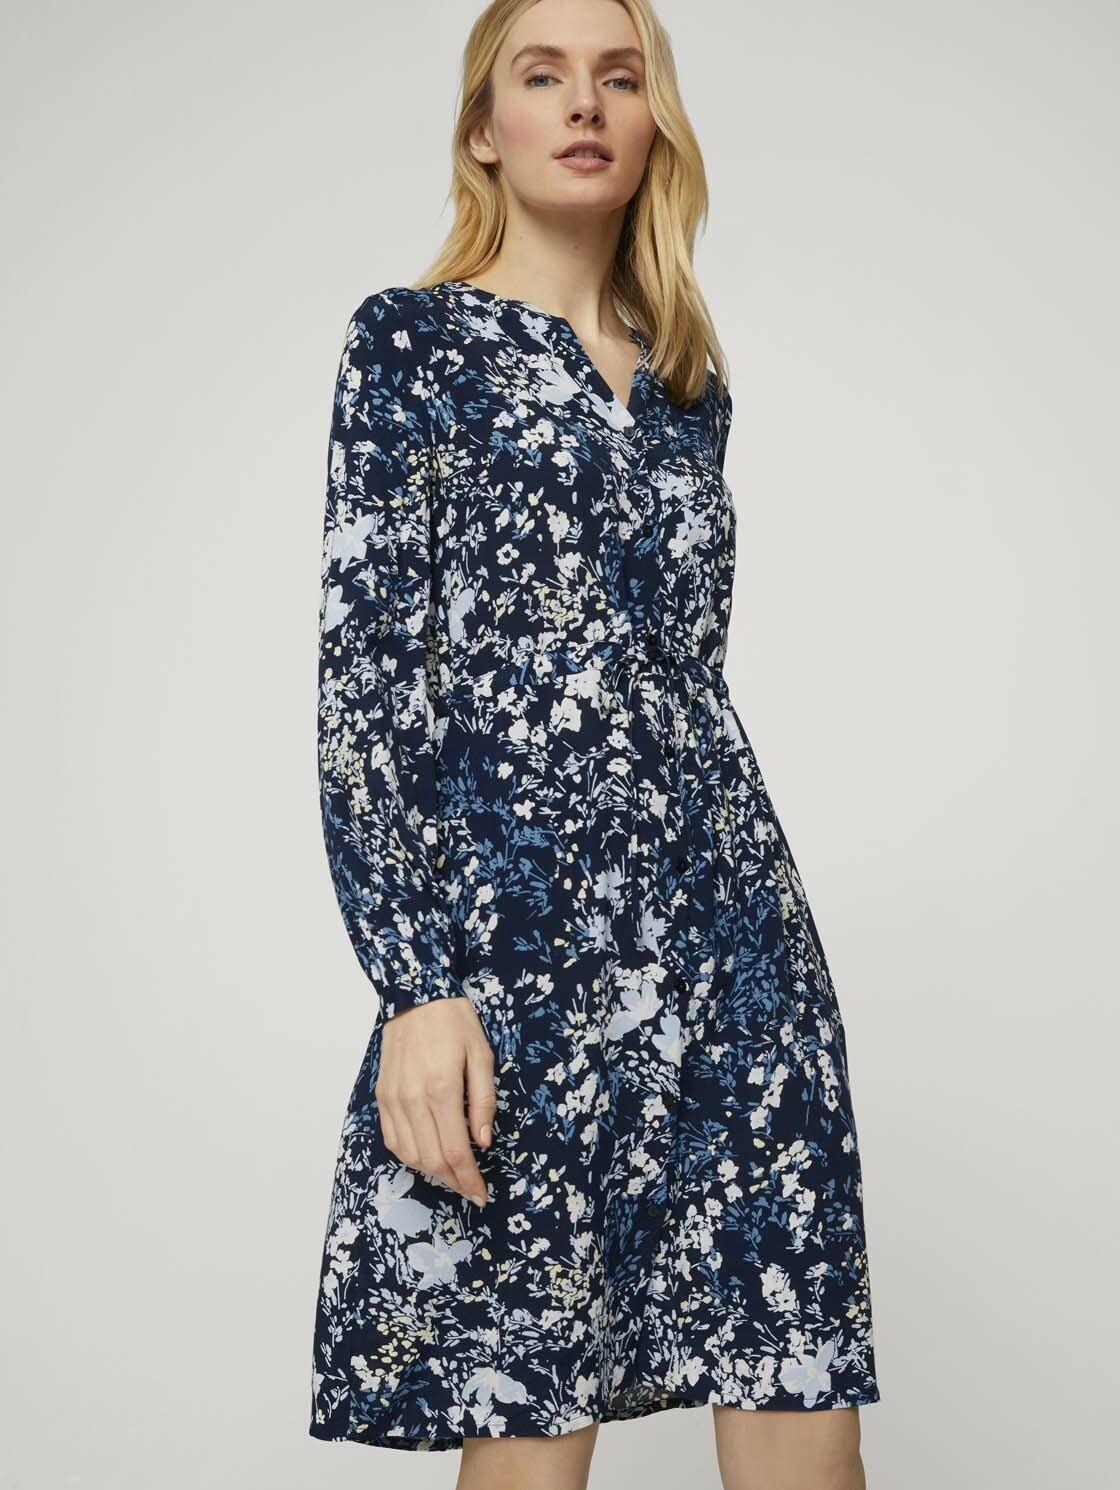 tom tailor -  Jeanskleid Gemustertes Blusenkleid